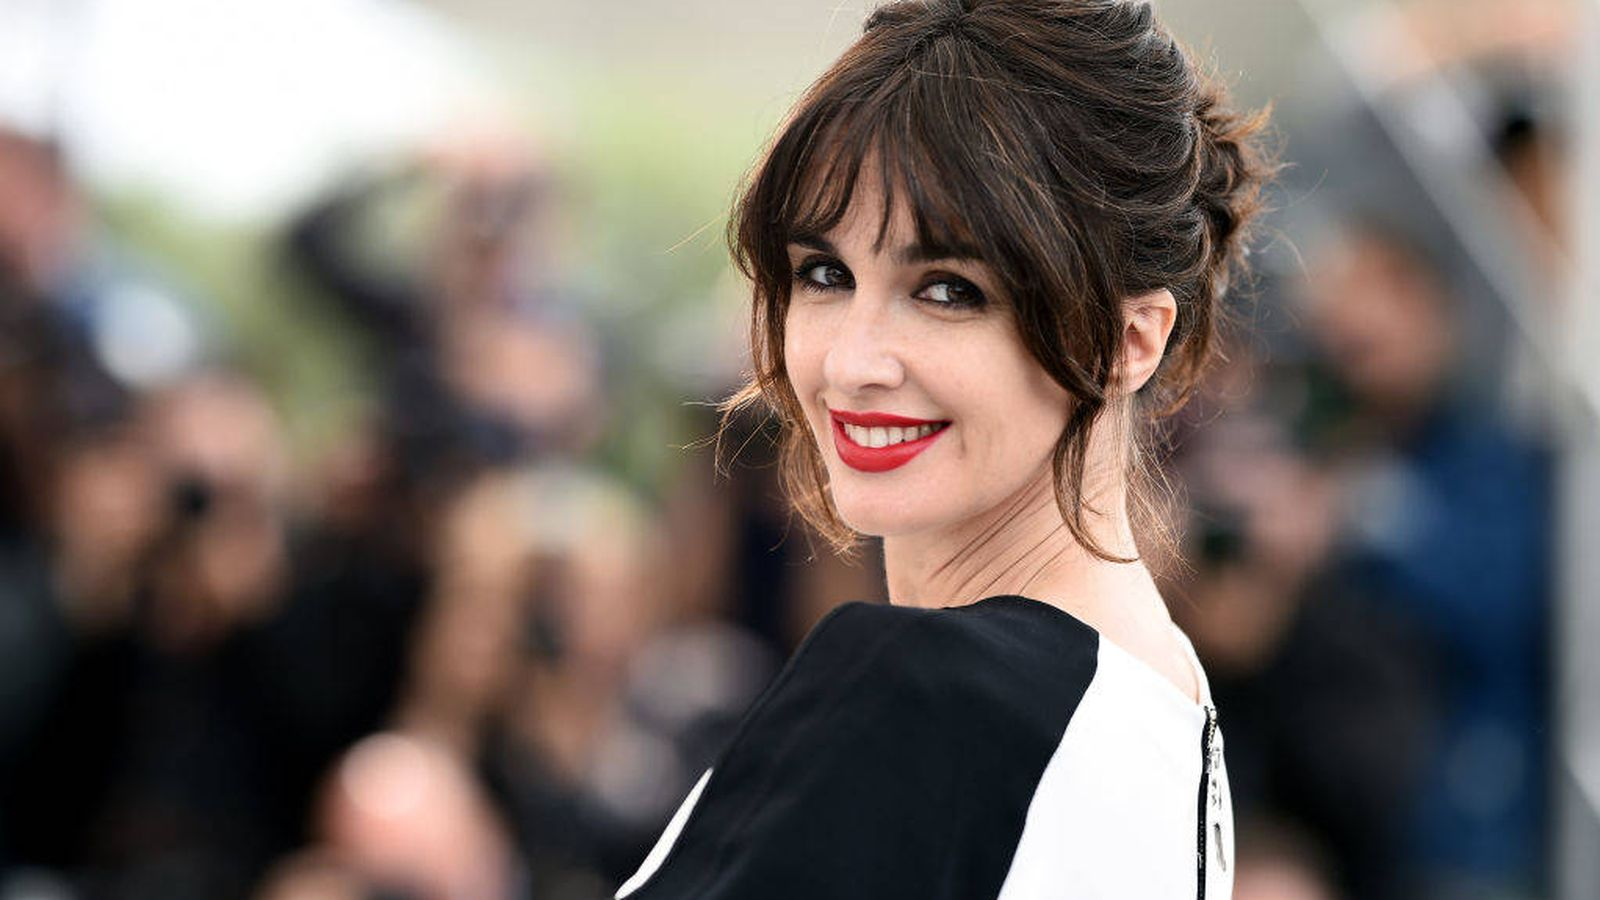 Foto: Paz Vega, en el Festival de Cannes. (Getty)